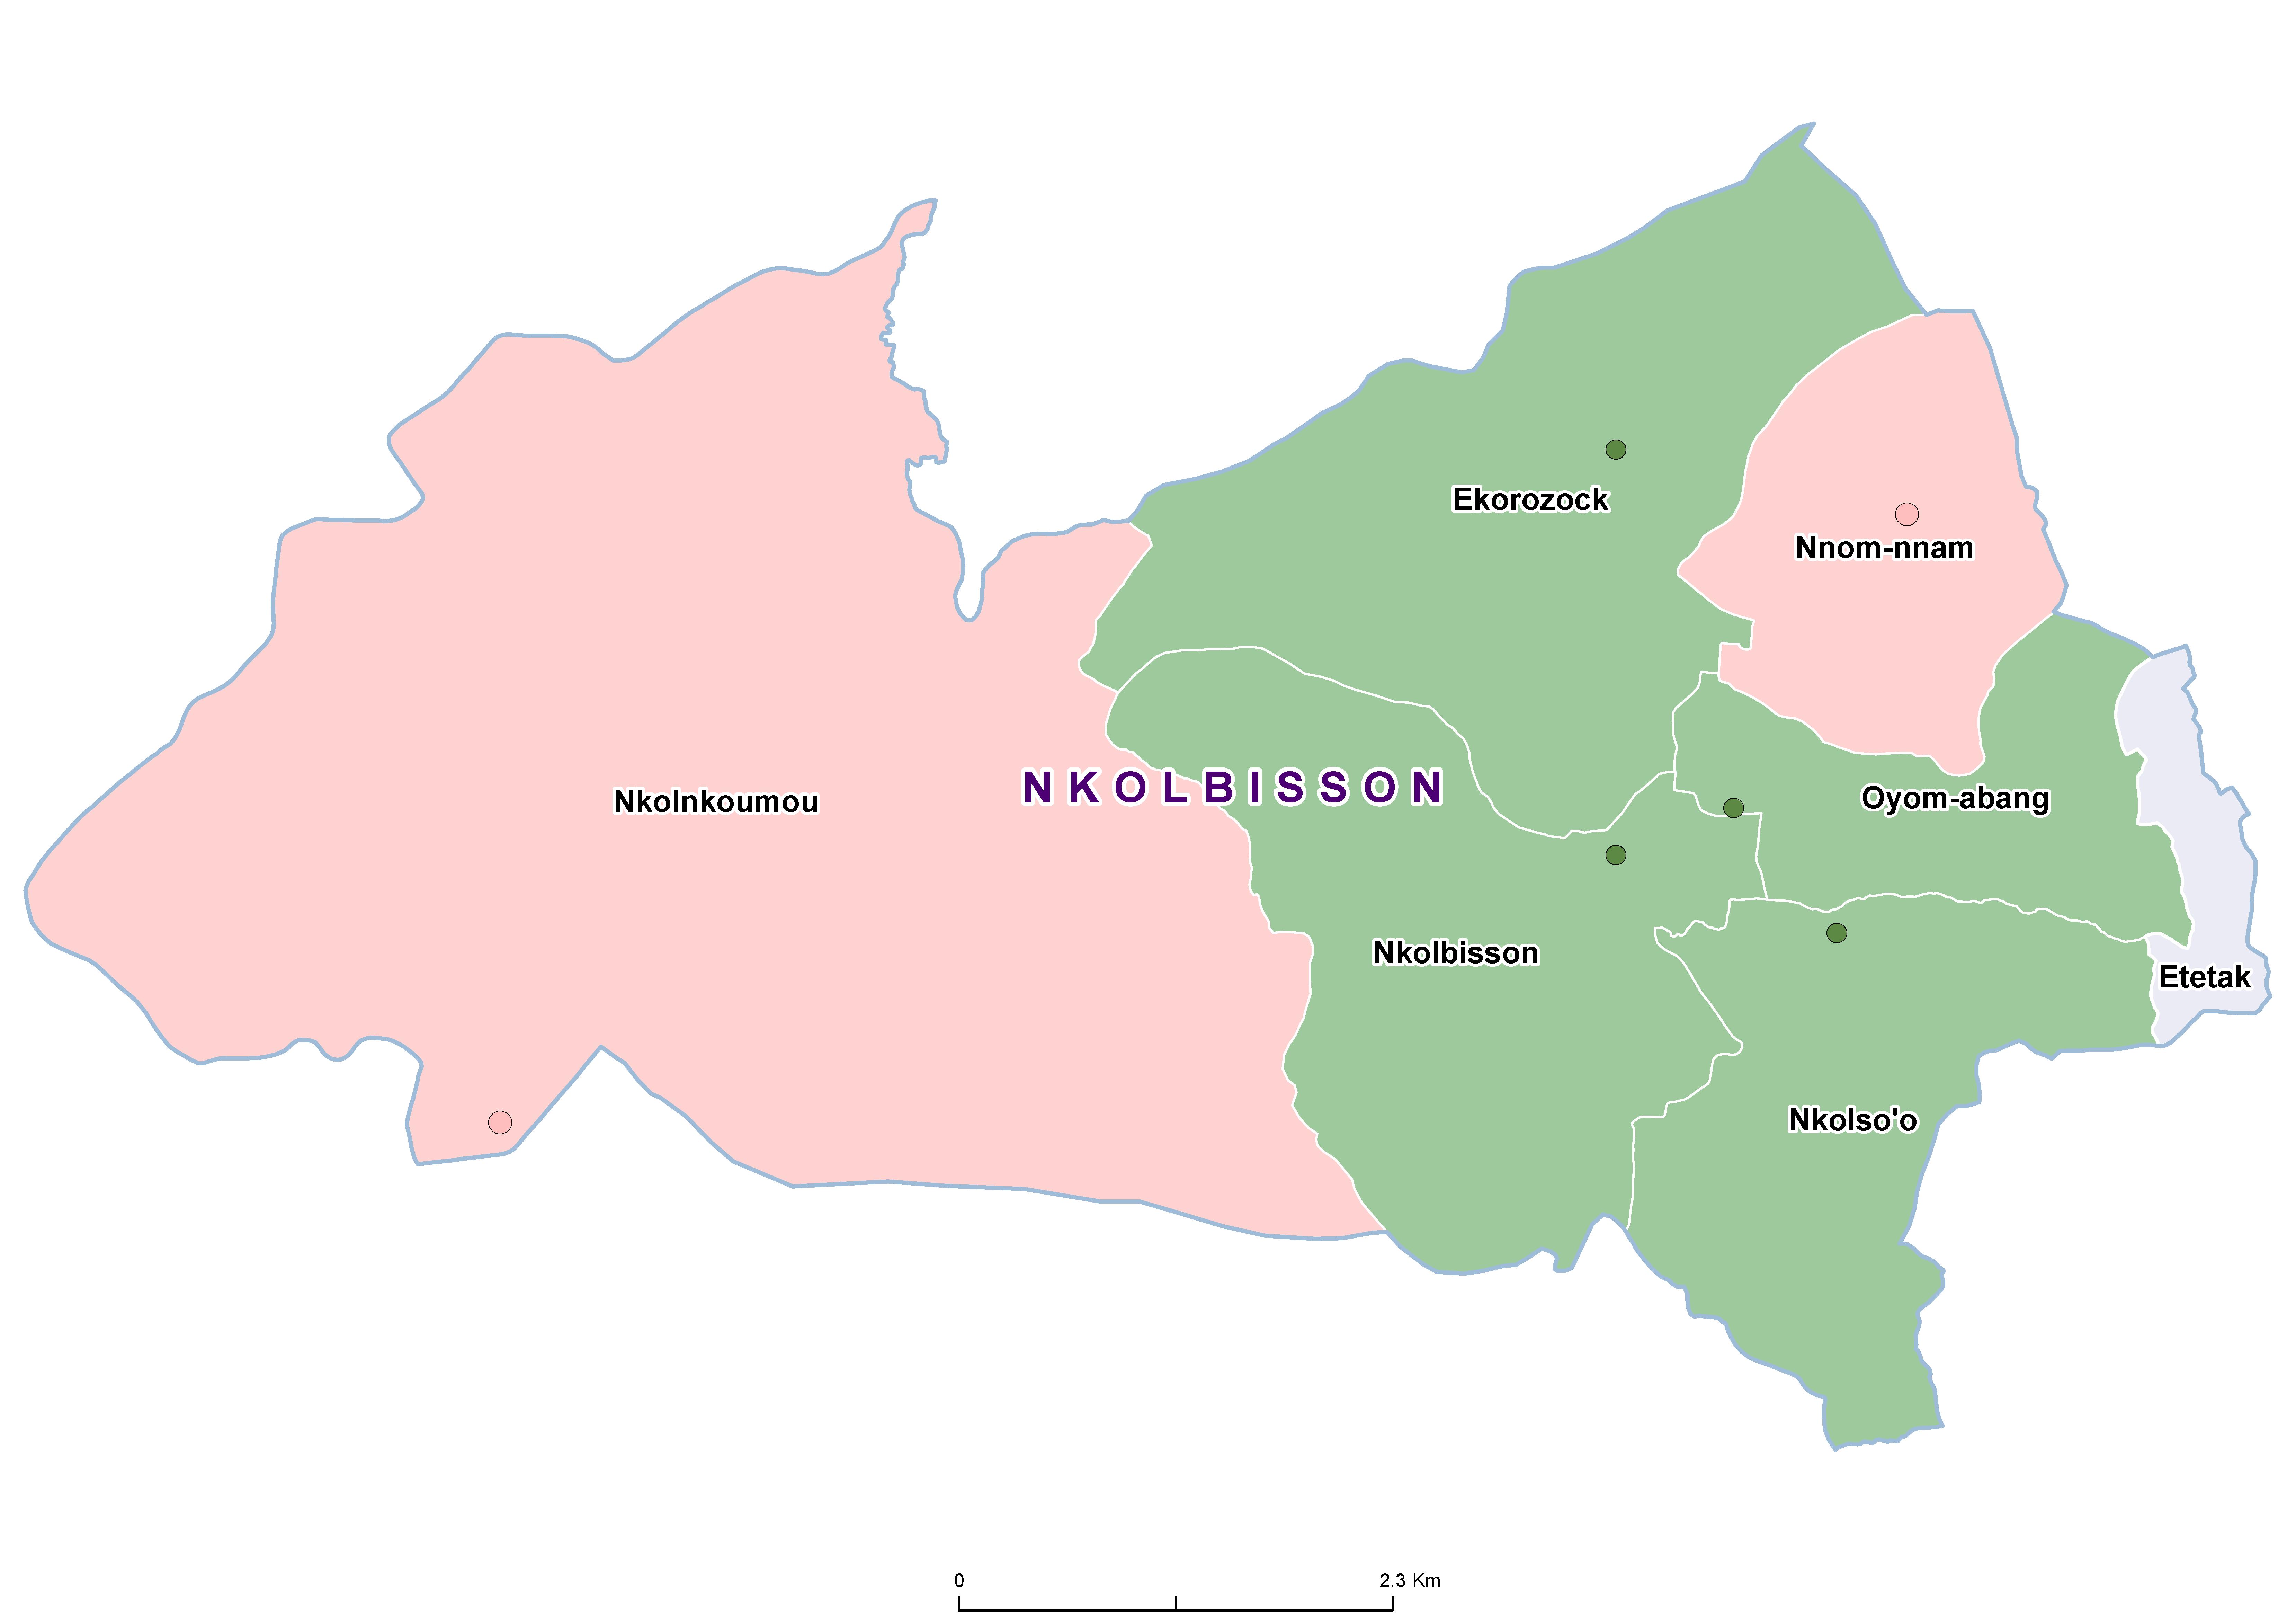 Nkolbisson STH 20180001